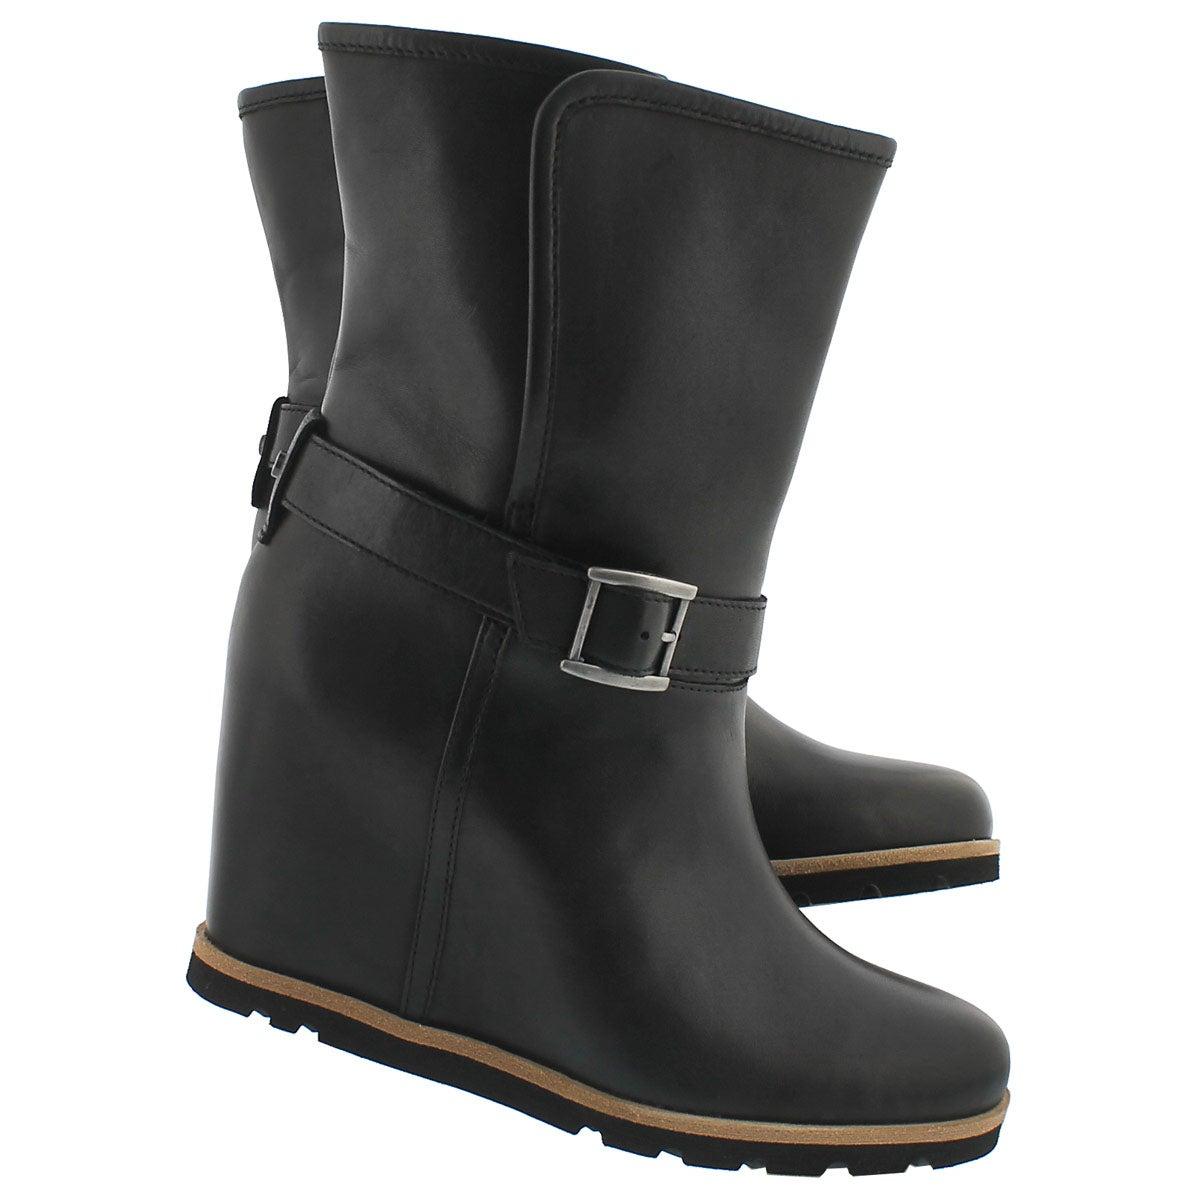 Lds Ellecia blk wedge dress boot